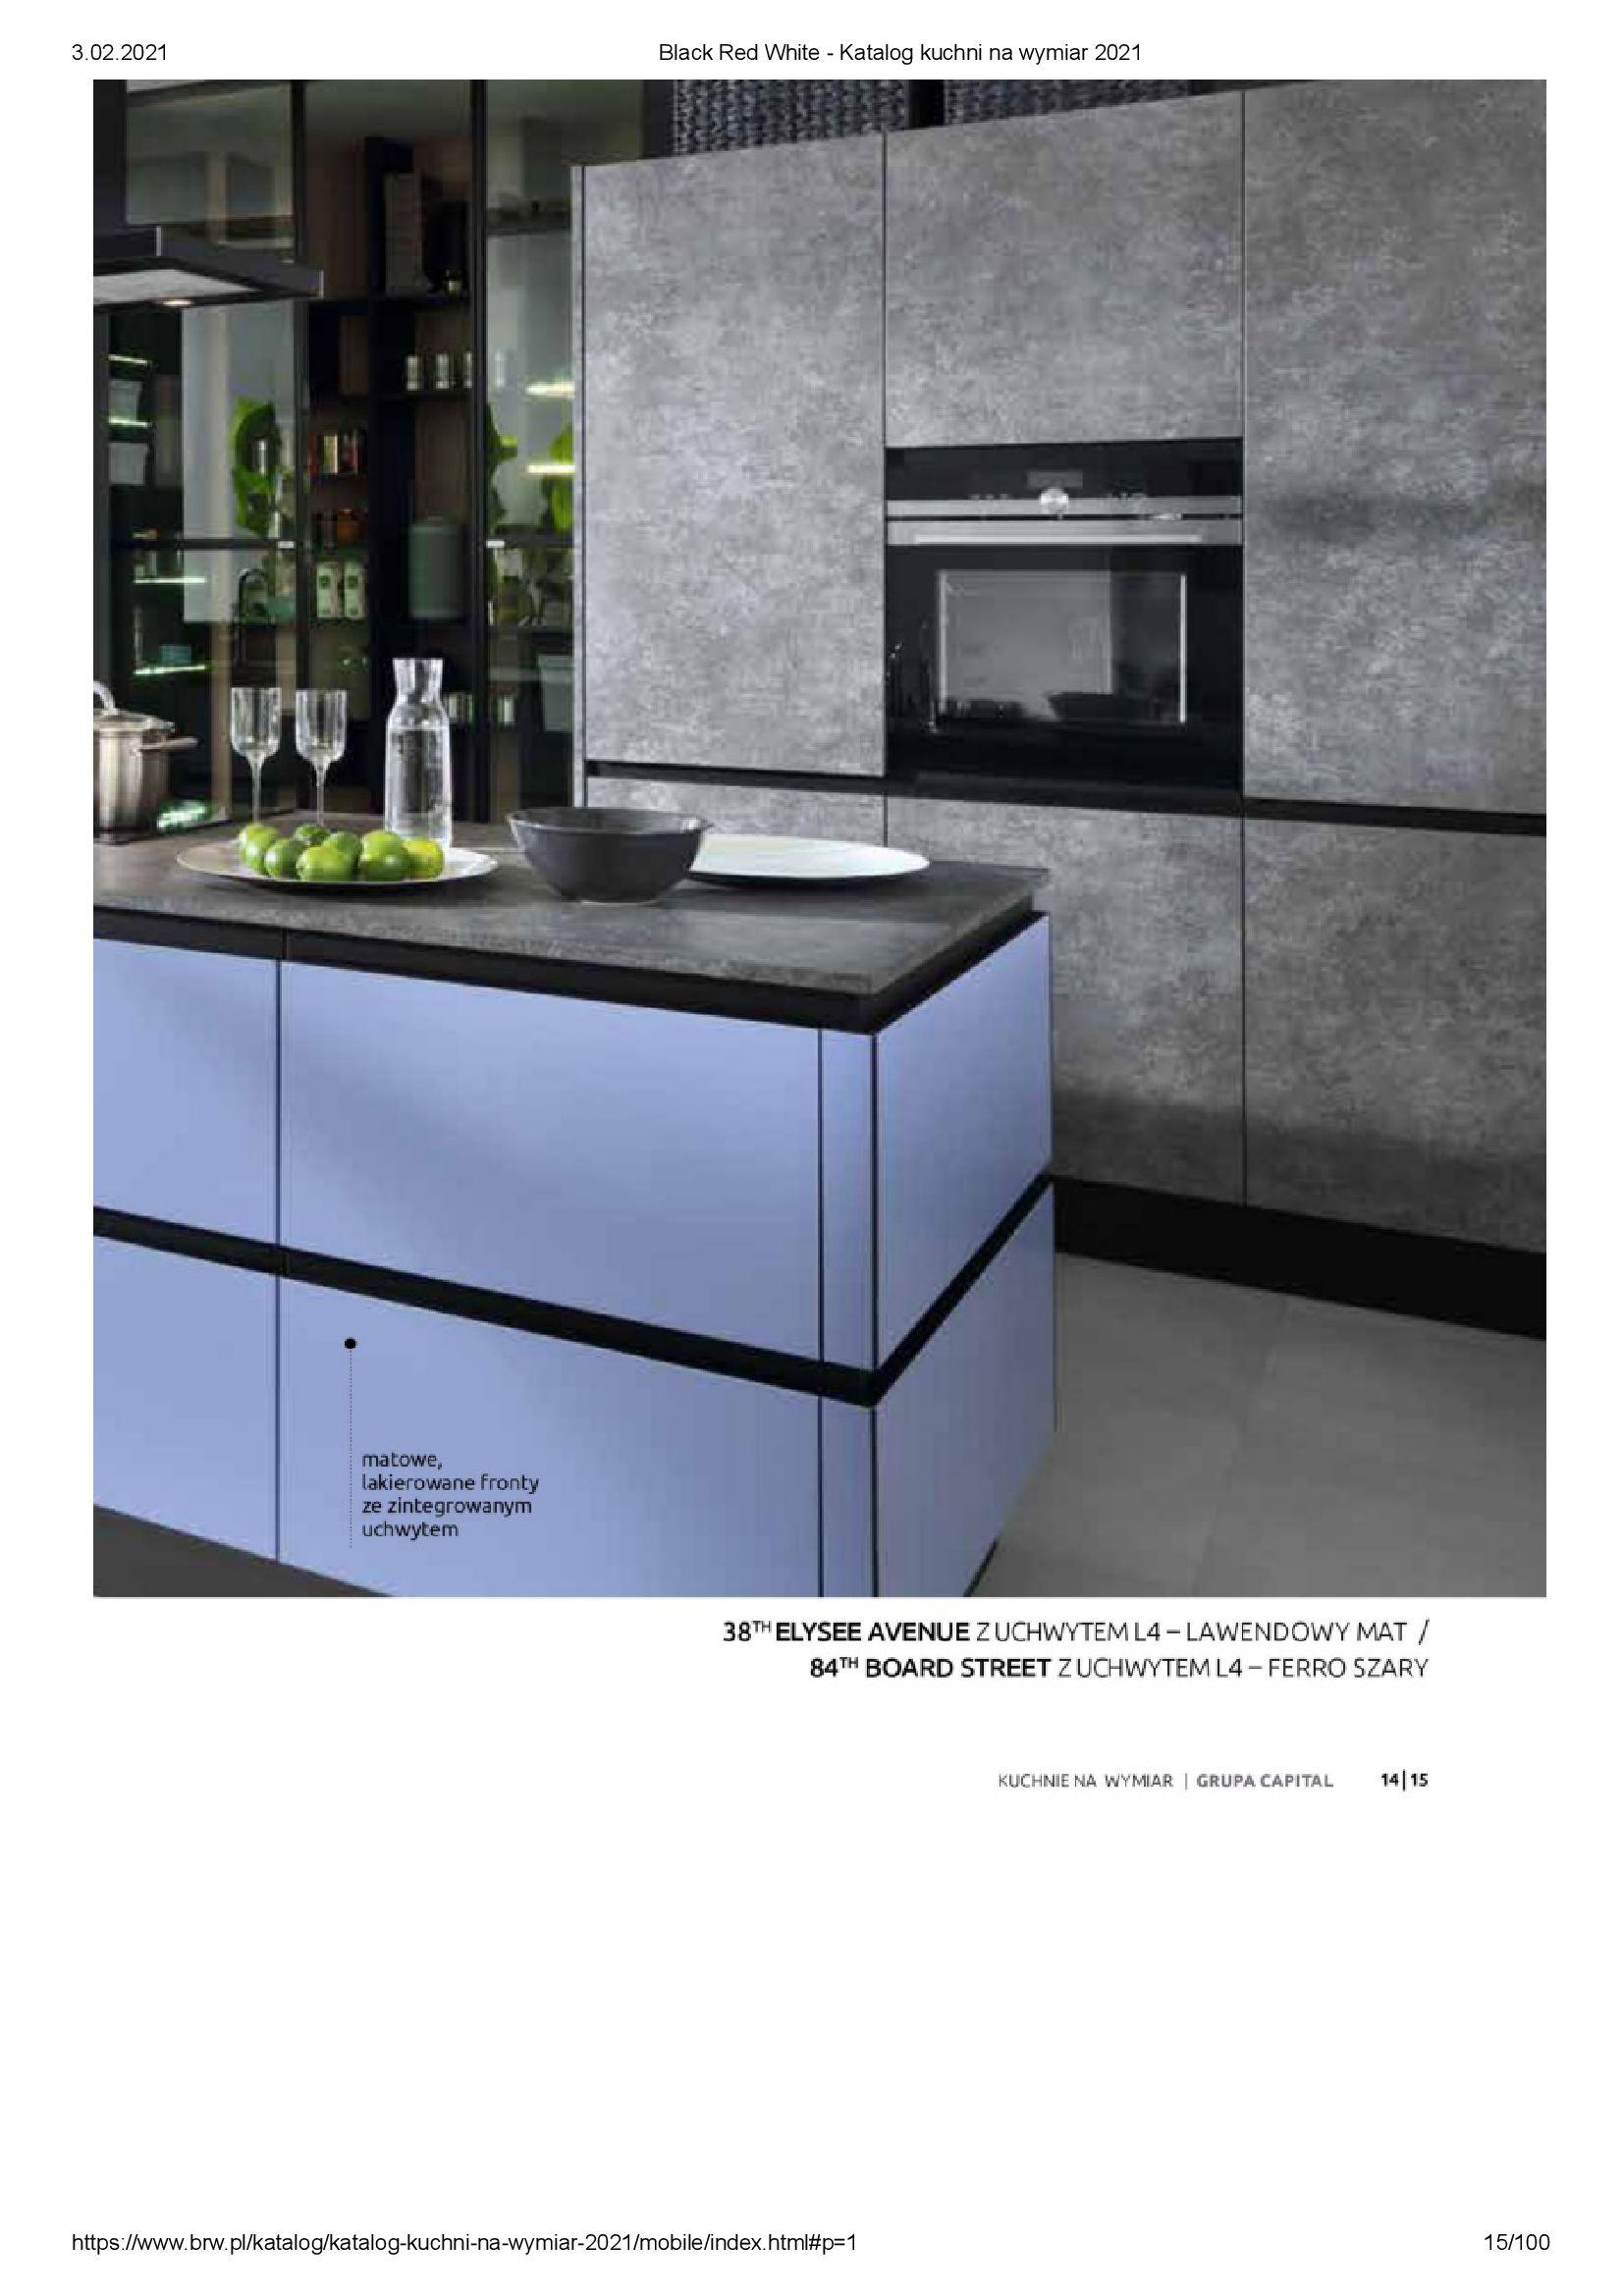 Gazetka Black Red White: Katalog - Kuchnie na wymiar Senso Kitchens 2021 2021-01-01 page-15